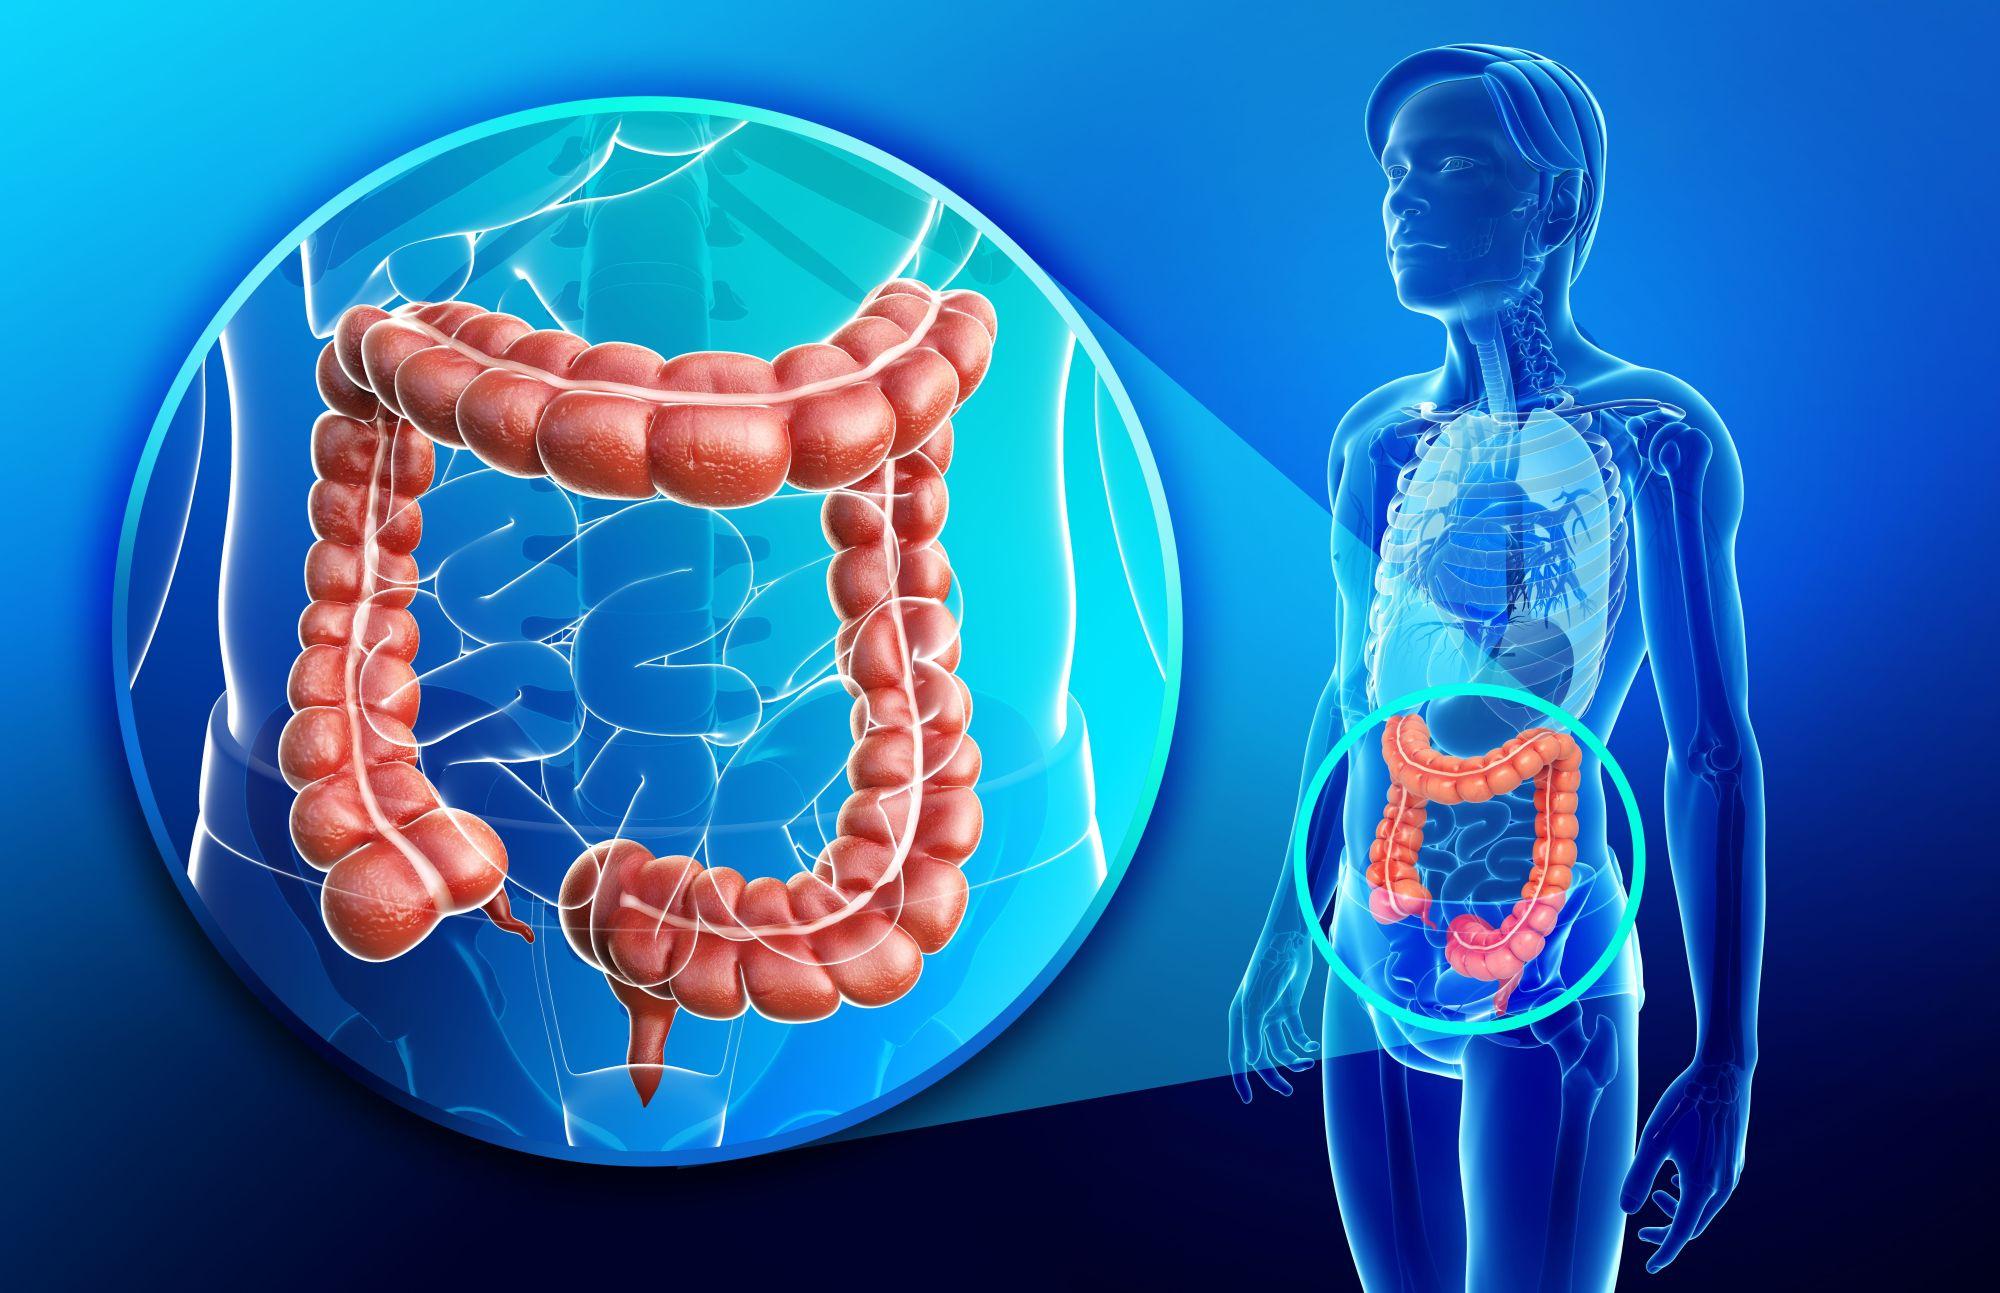 hight resolution of digital illustration of colon anatomy